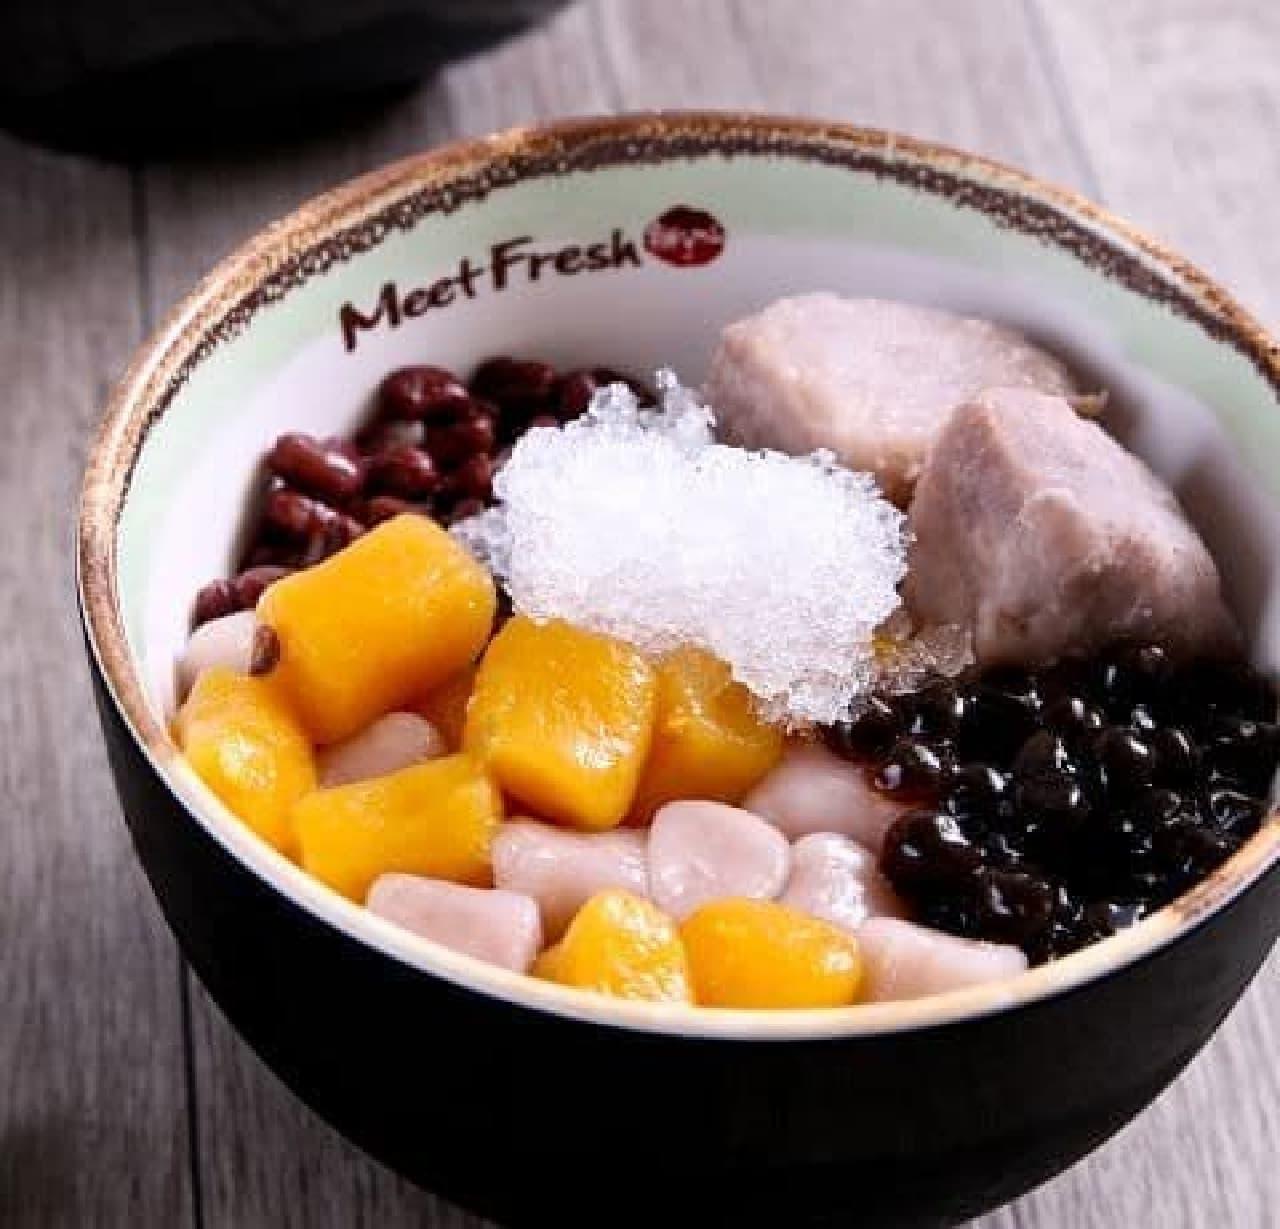 MeetFresh 鮮芋仙「芋園」